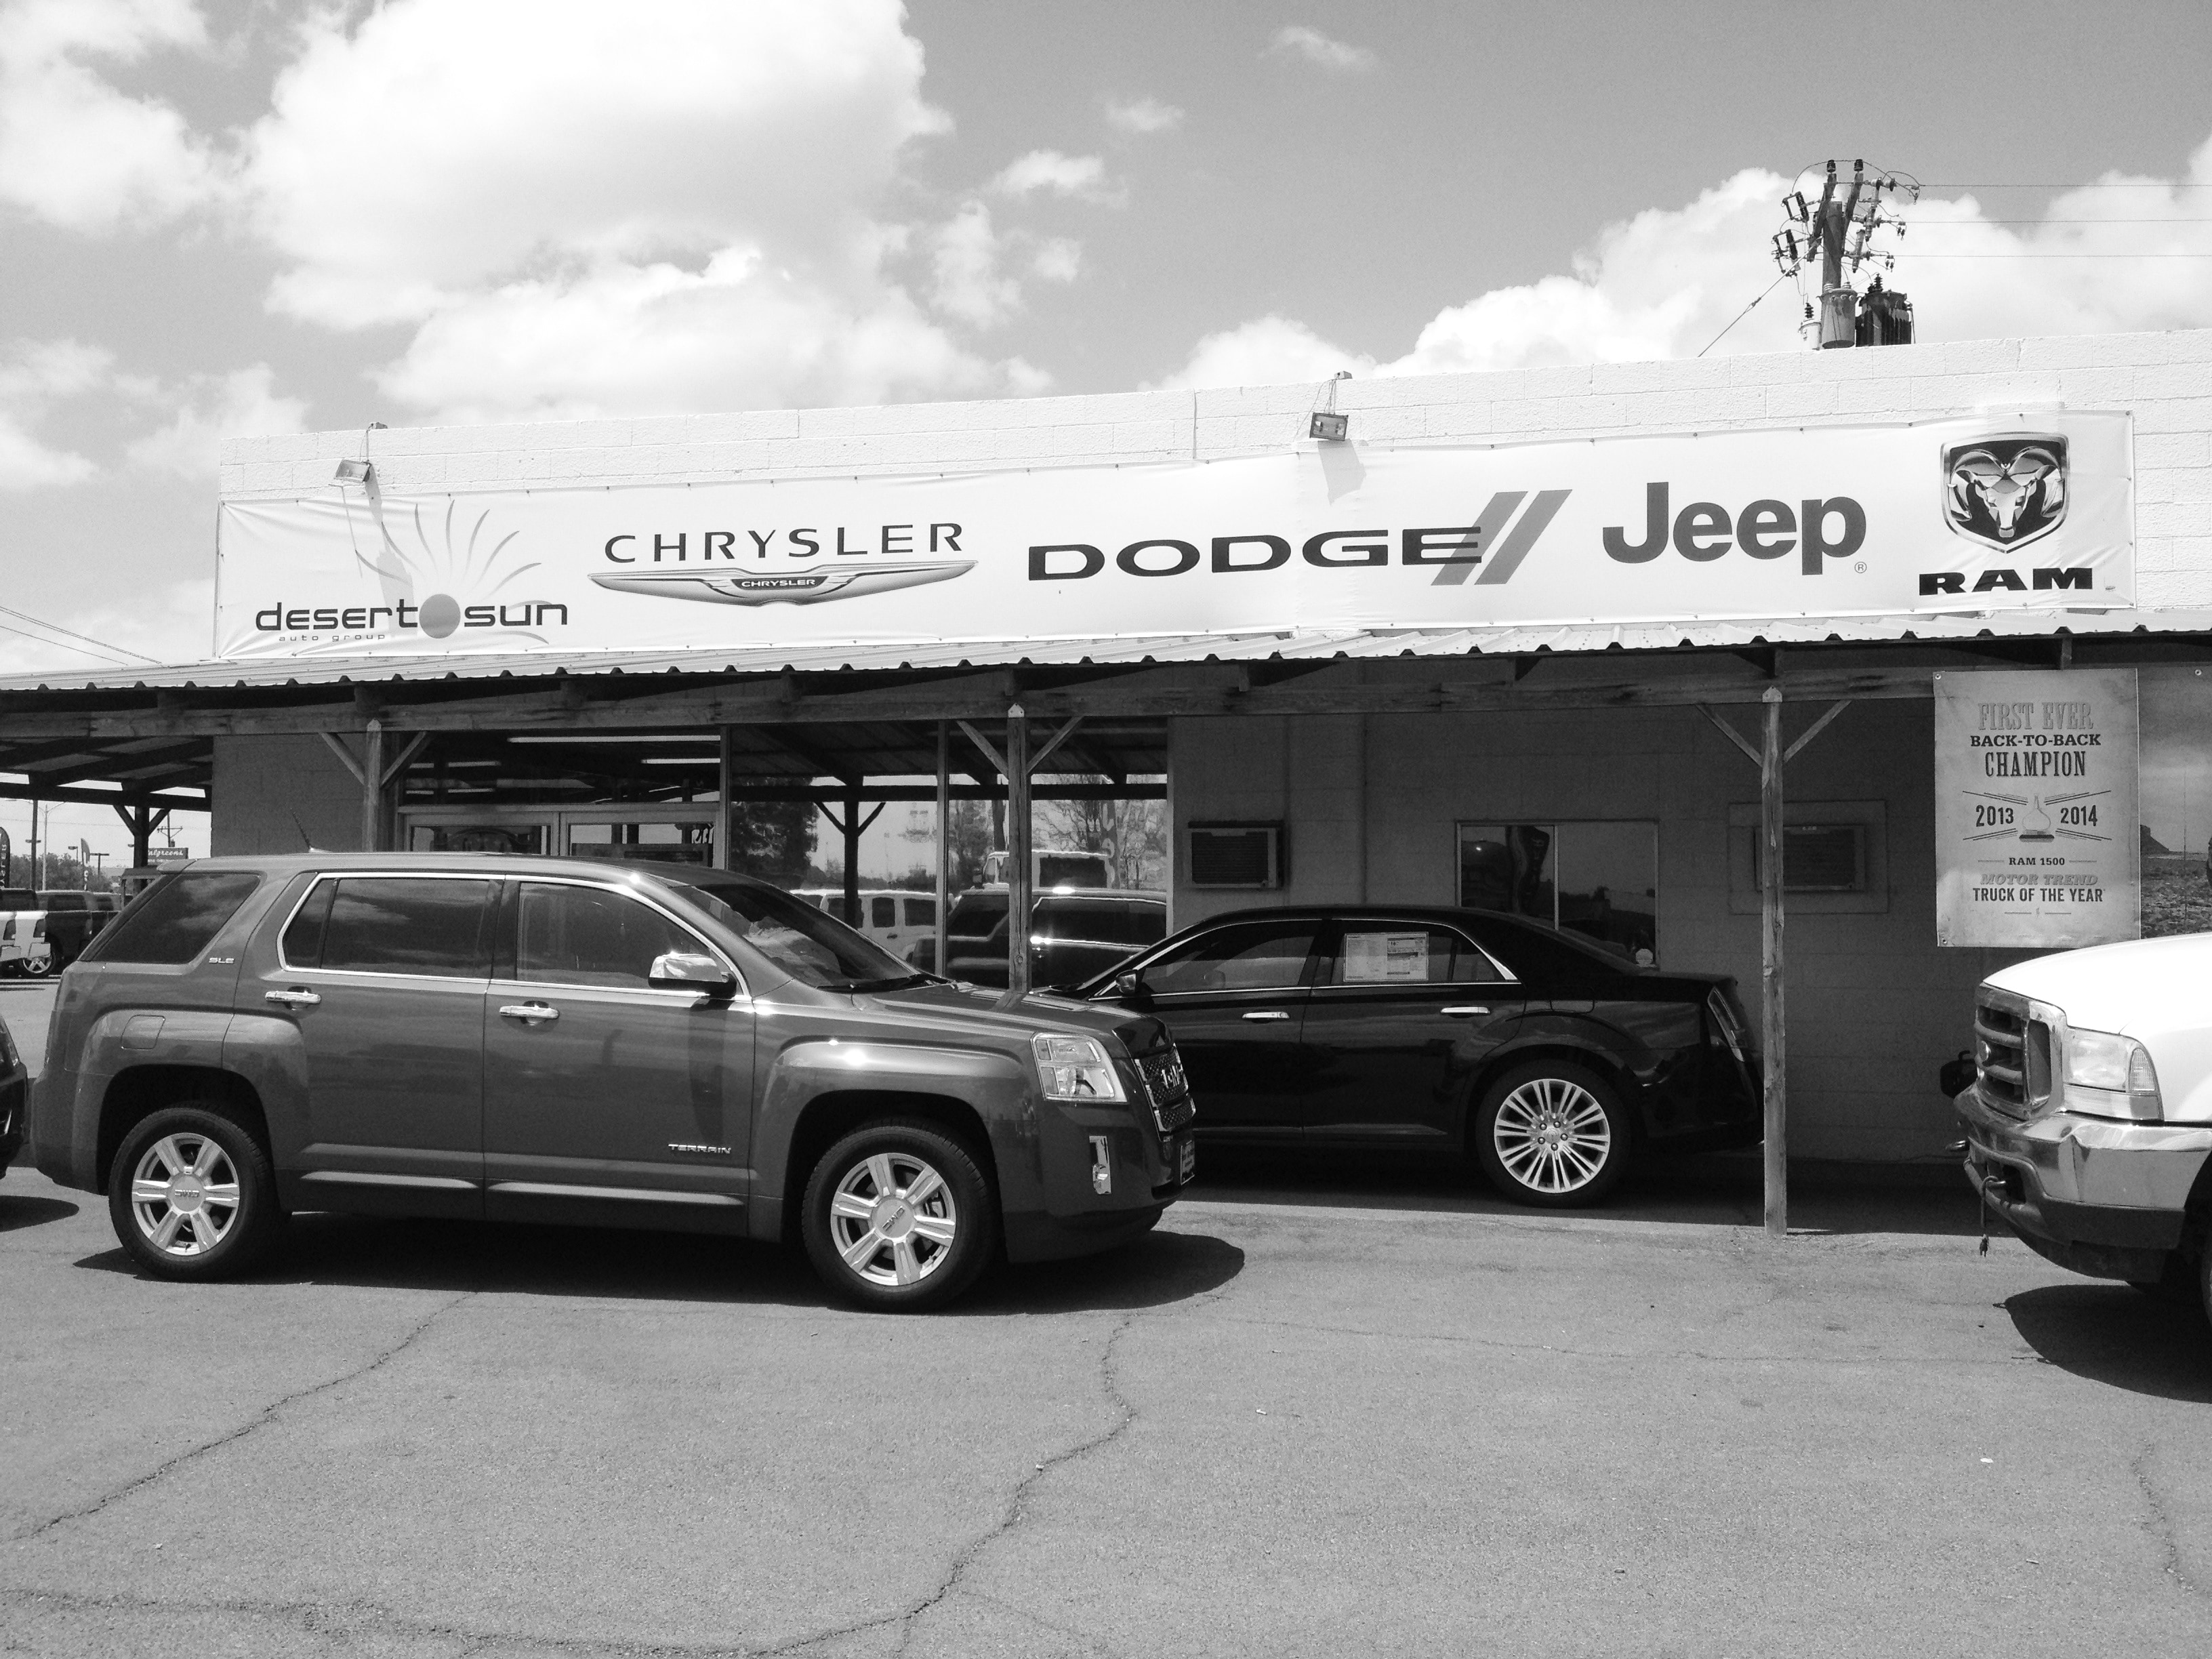 Desert Sun Gmc Roswell >> About Desert Sun In Roswell Nm New Used Chrysler Dodge Jeep